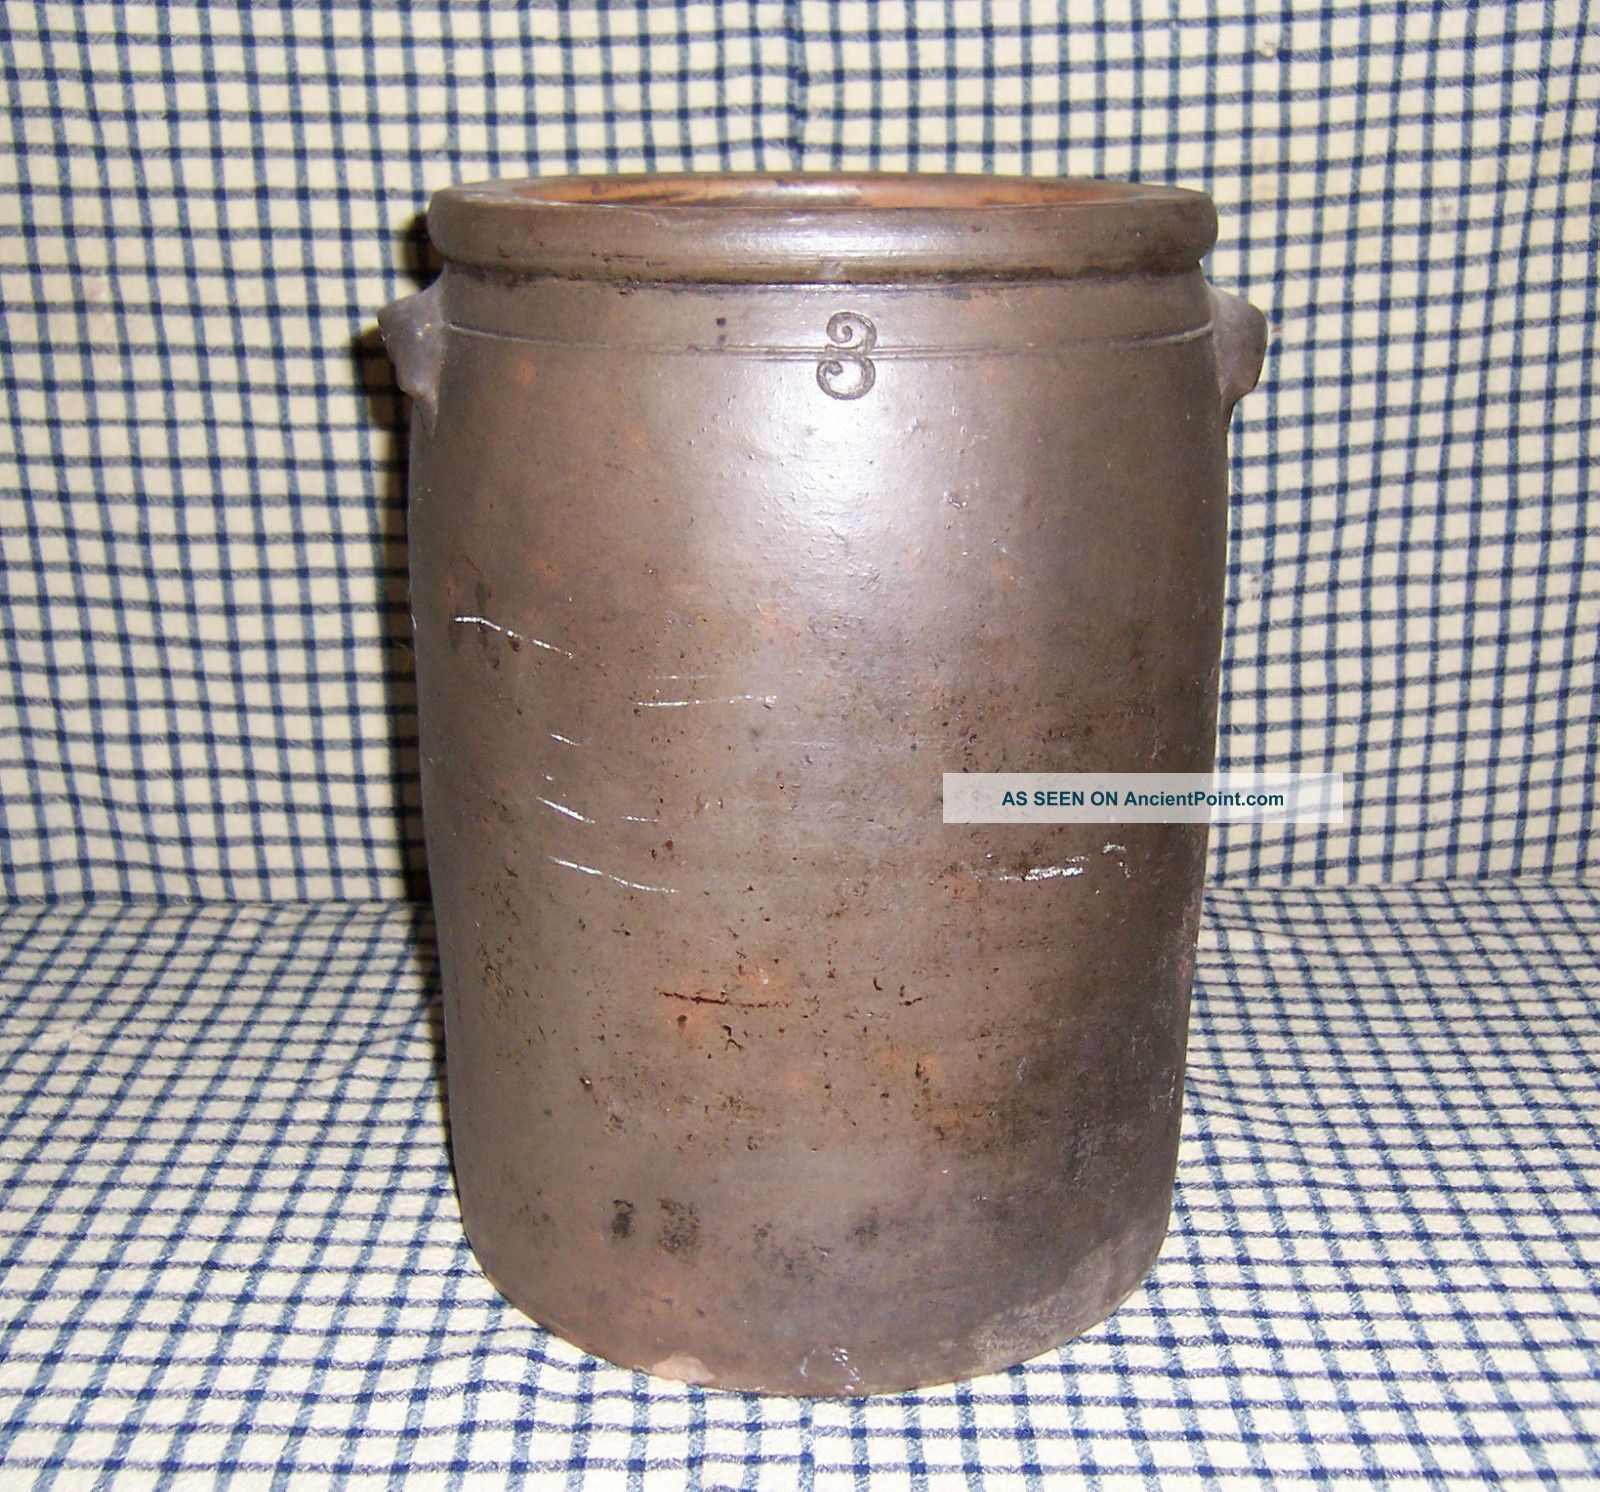 Antique 1800s Salt Glaze Stoneware Crock With Handles Crocks photo